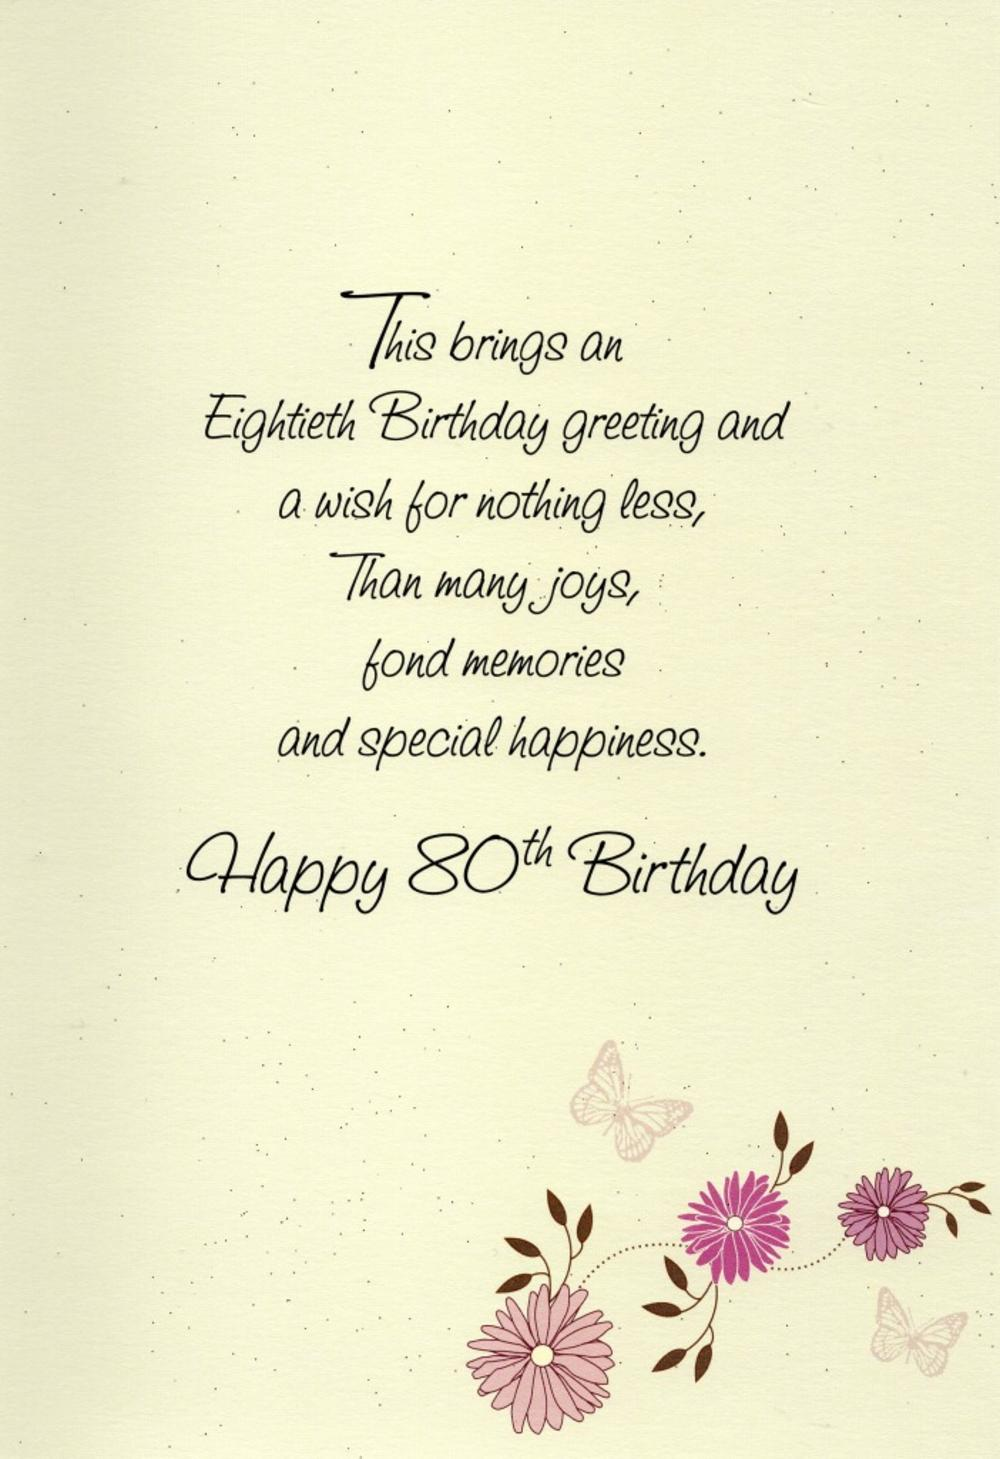 Happy 80th Birthday Greeting Card Cards Love Kates